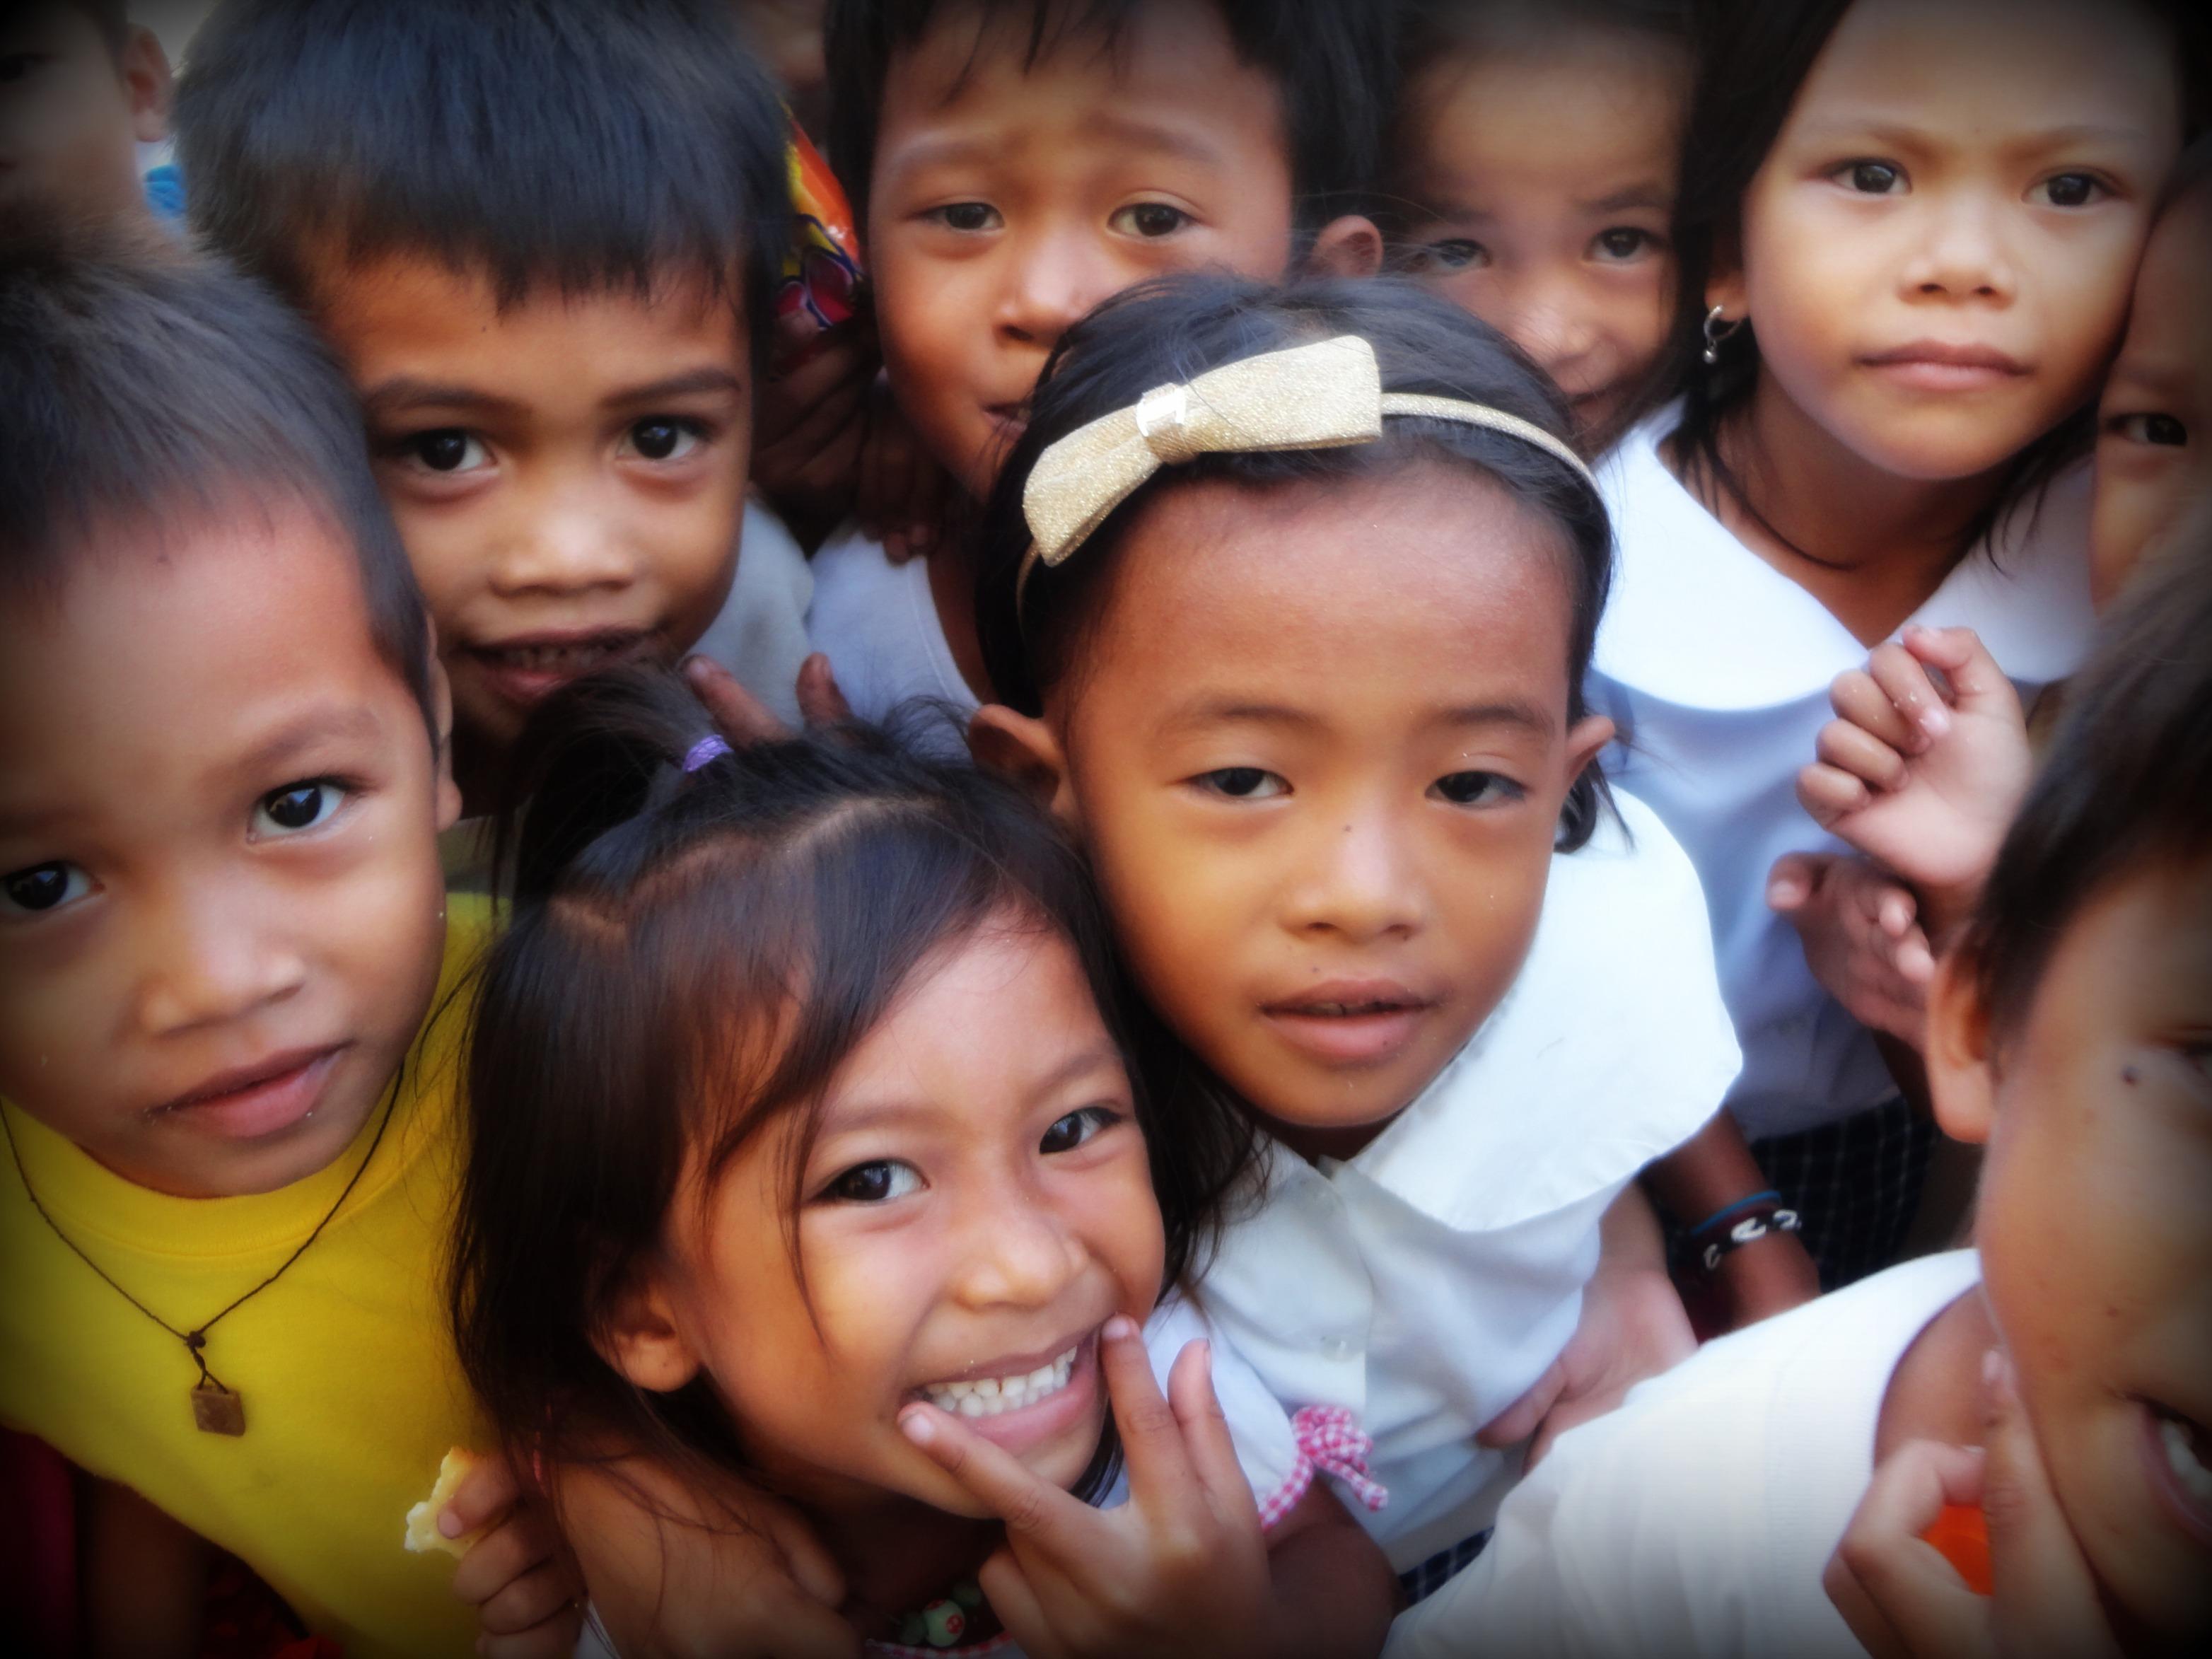 philippine small photo